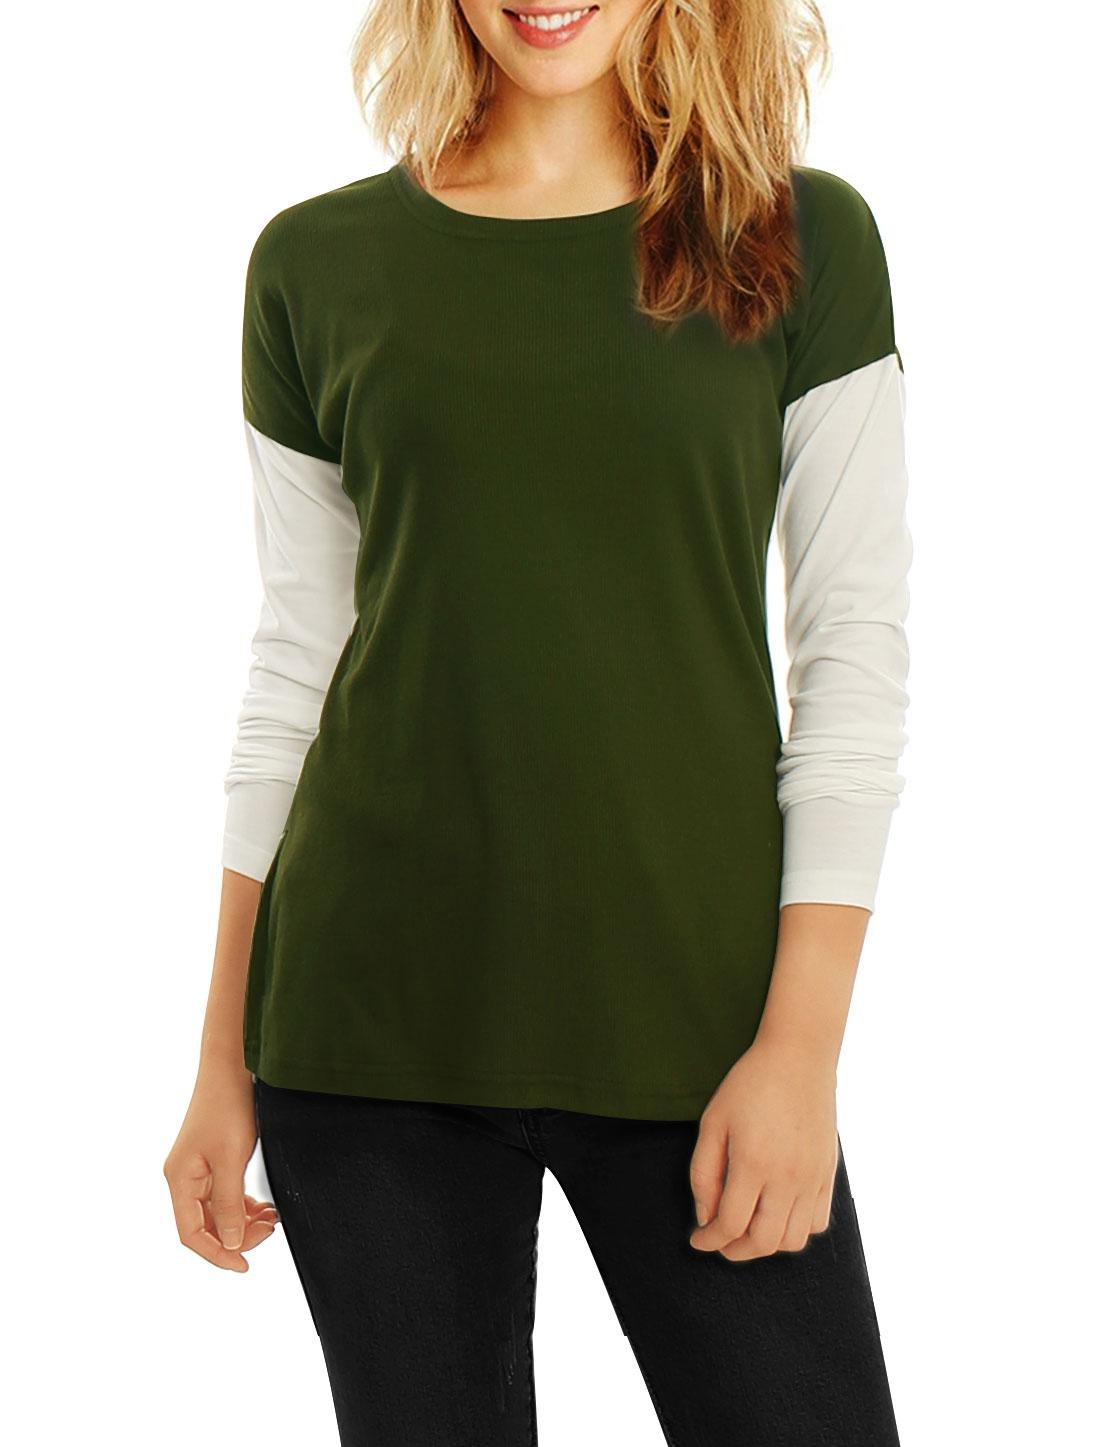 Women Color Block Side-Slit Paneled Slim Fit Ribbed Top Green M